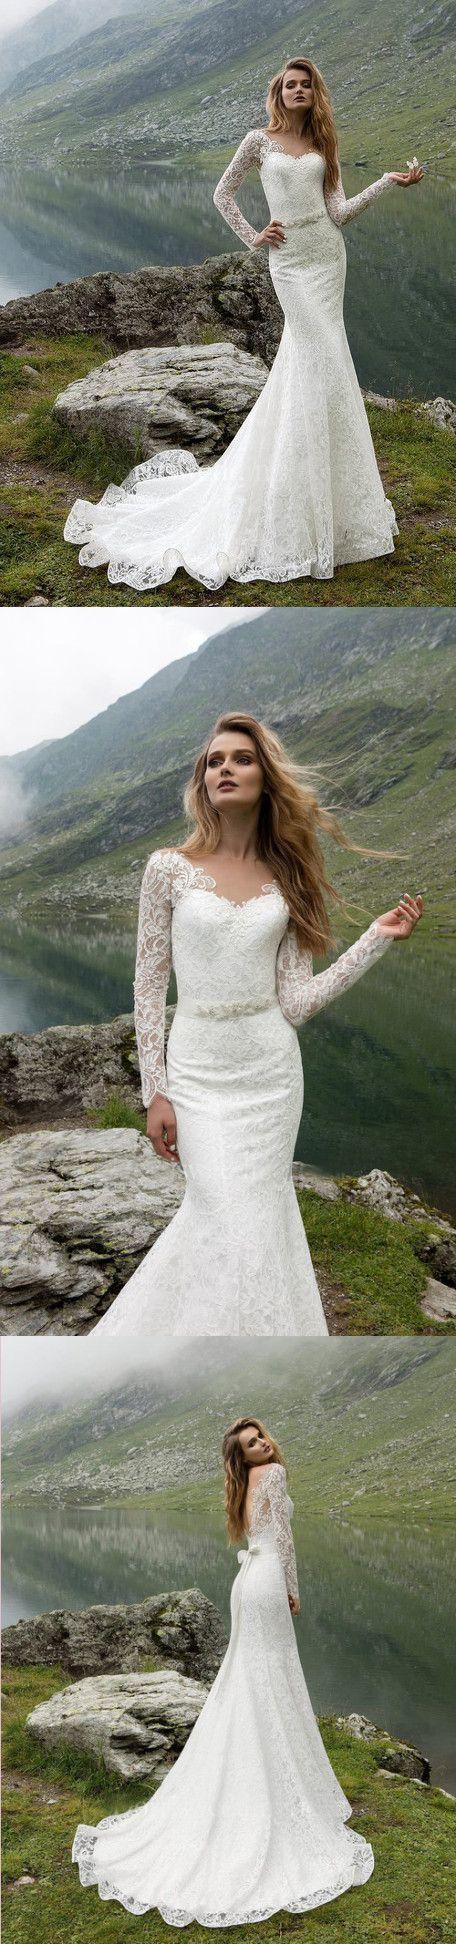 Charming Lace Mermaid Wedding Dresses, Full Sleeve Wedding Gown